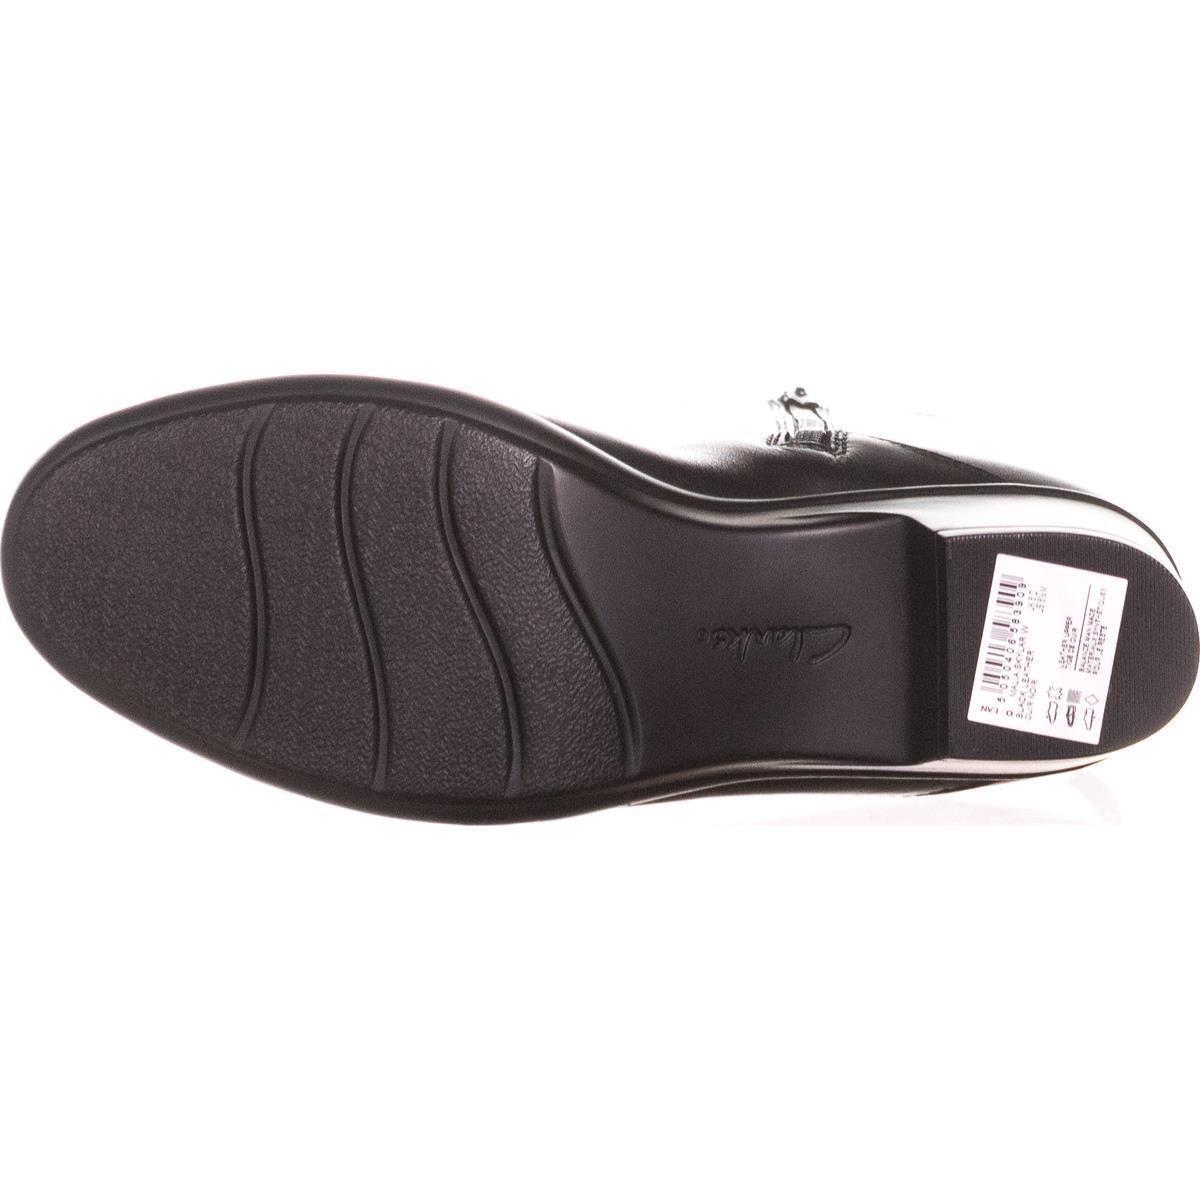 9c27d1720727 Clarks Malia Skylar Wide Calf Riding Boots in Black - Lyst